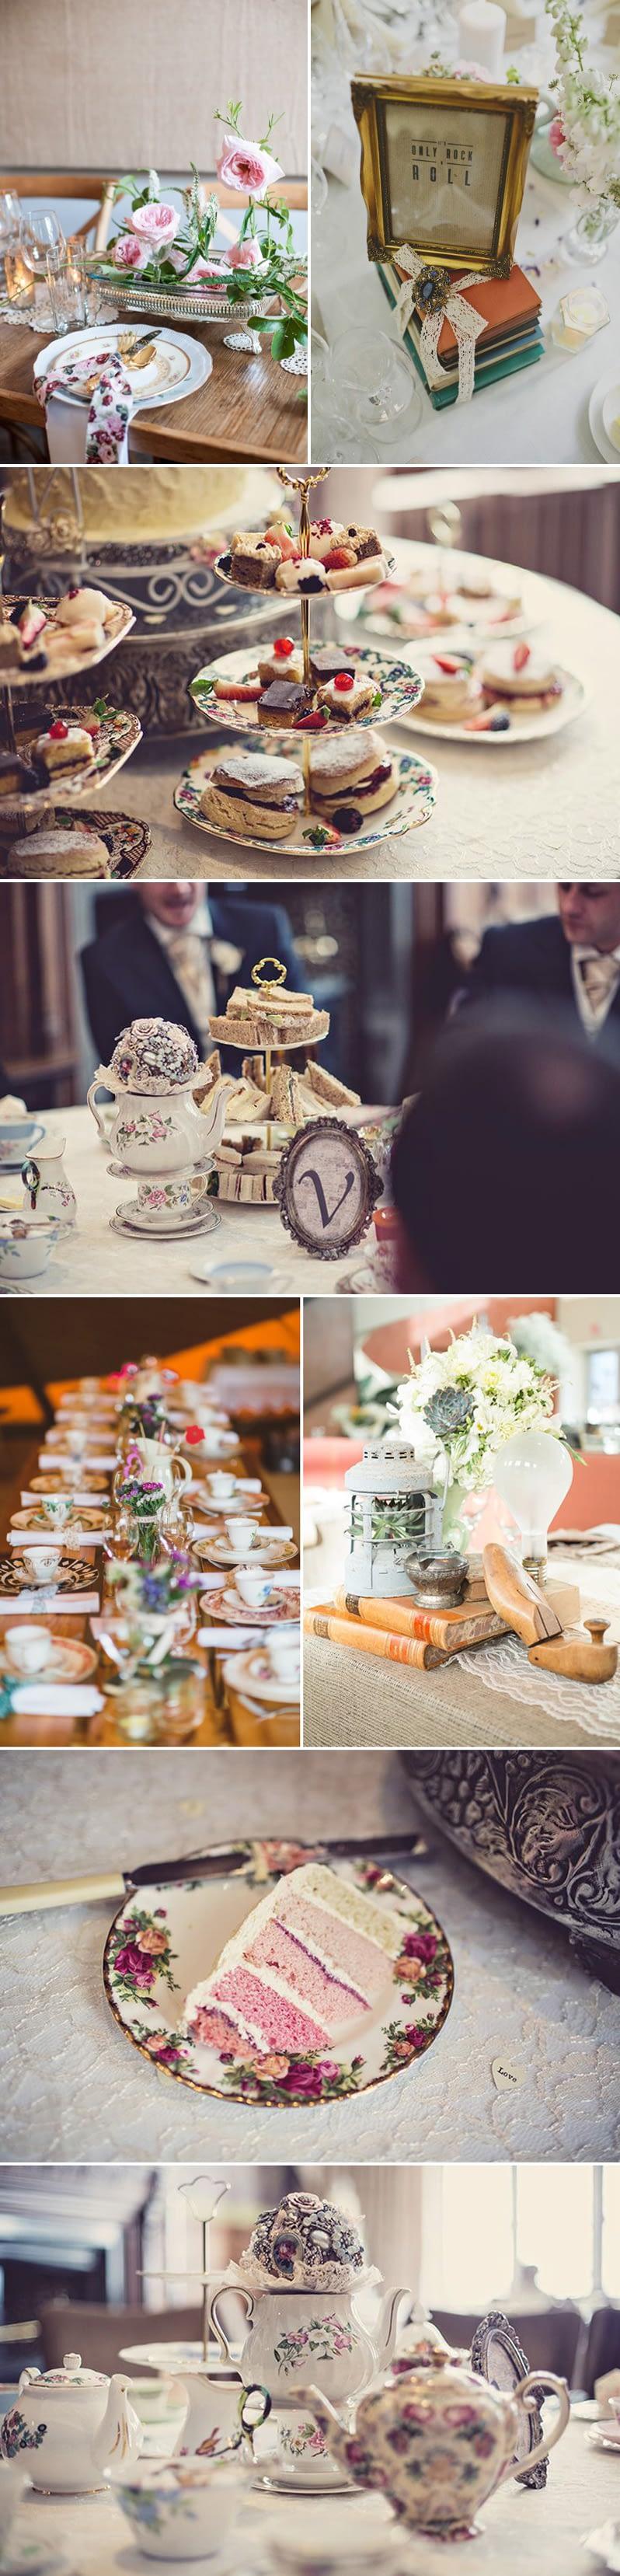 Coco Wedding Venues - Modern Vintage - Wedding Style Category - Tea Party.